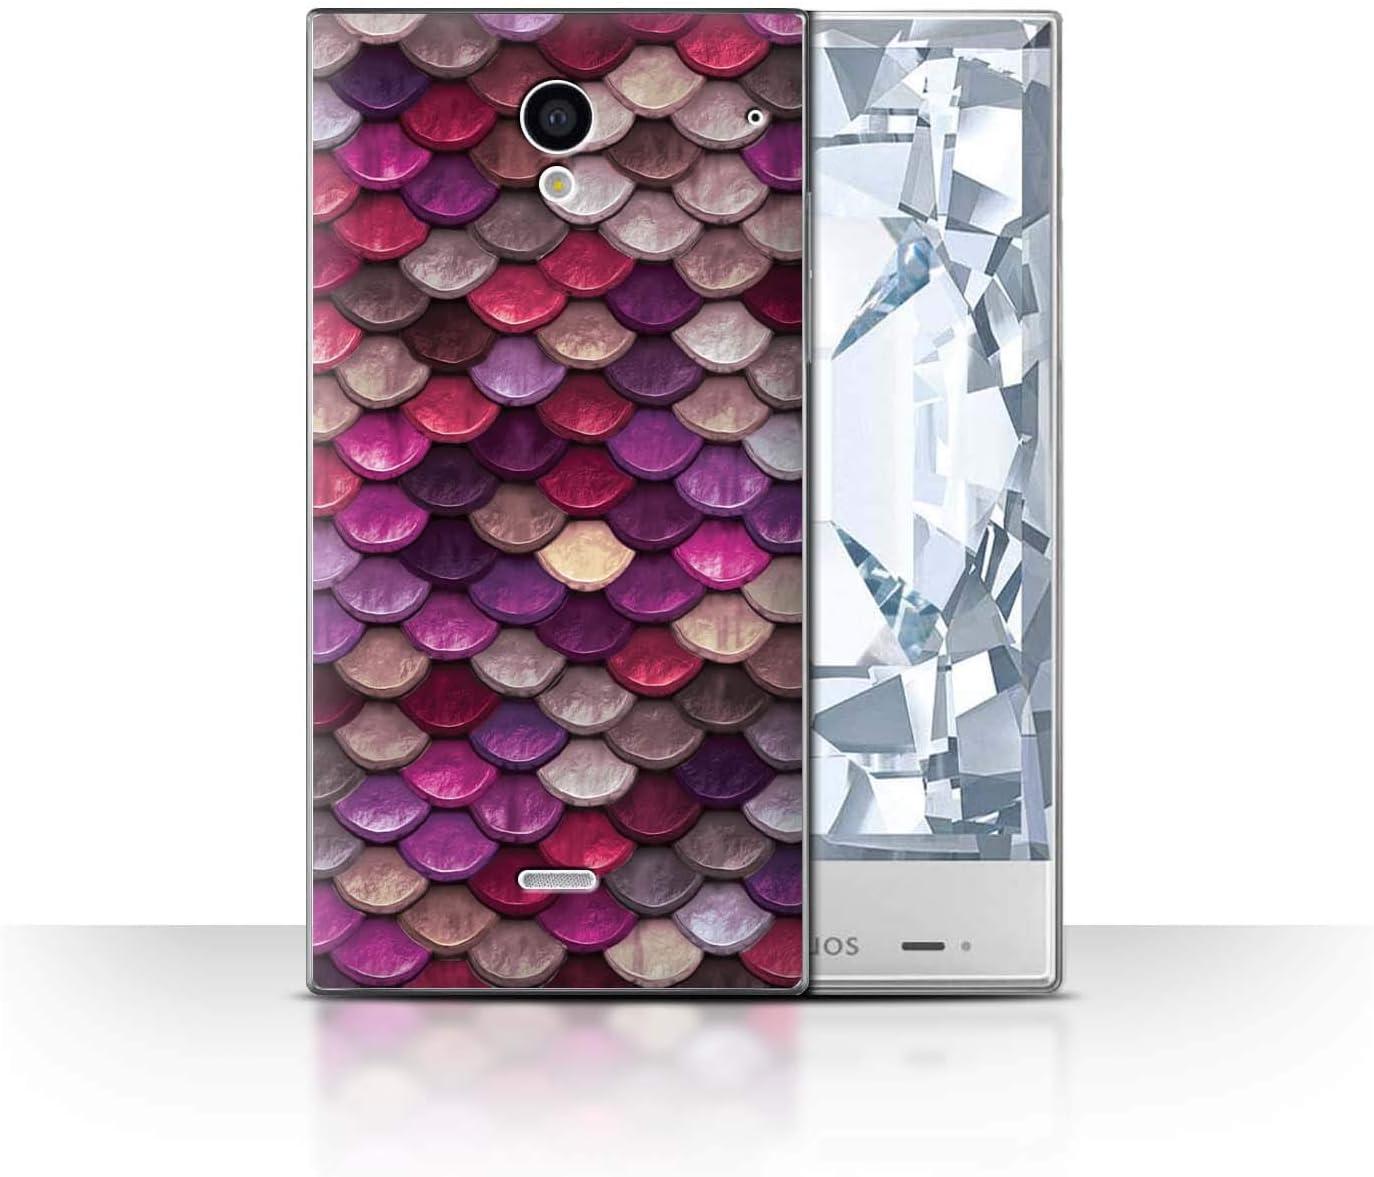 Stuff4® Phone Case/Cover/Skin/SP-CC/Watercolour Mermaid Scales Collection Rosa/Morado Sharp Aquos Crystal/306SH: Amazon.es: Informática